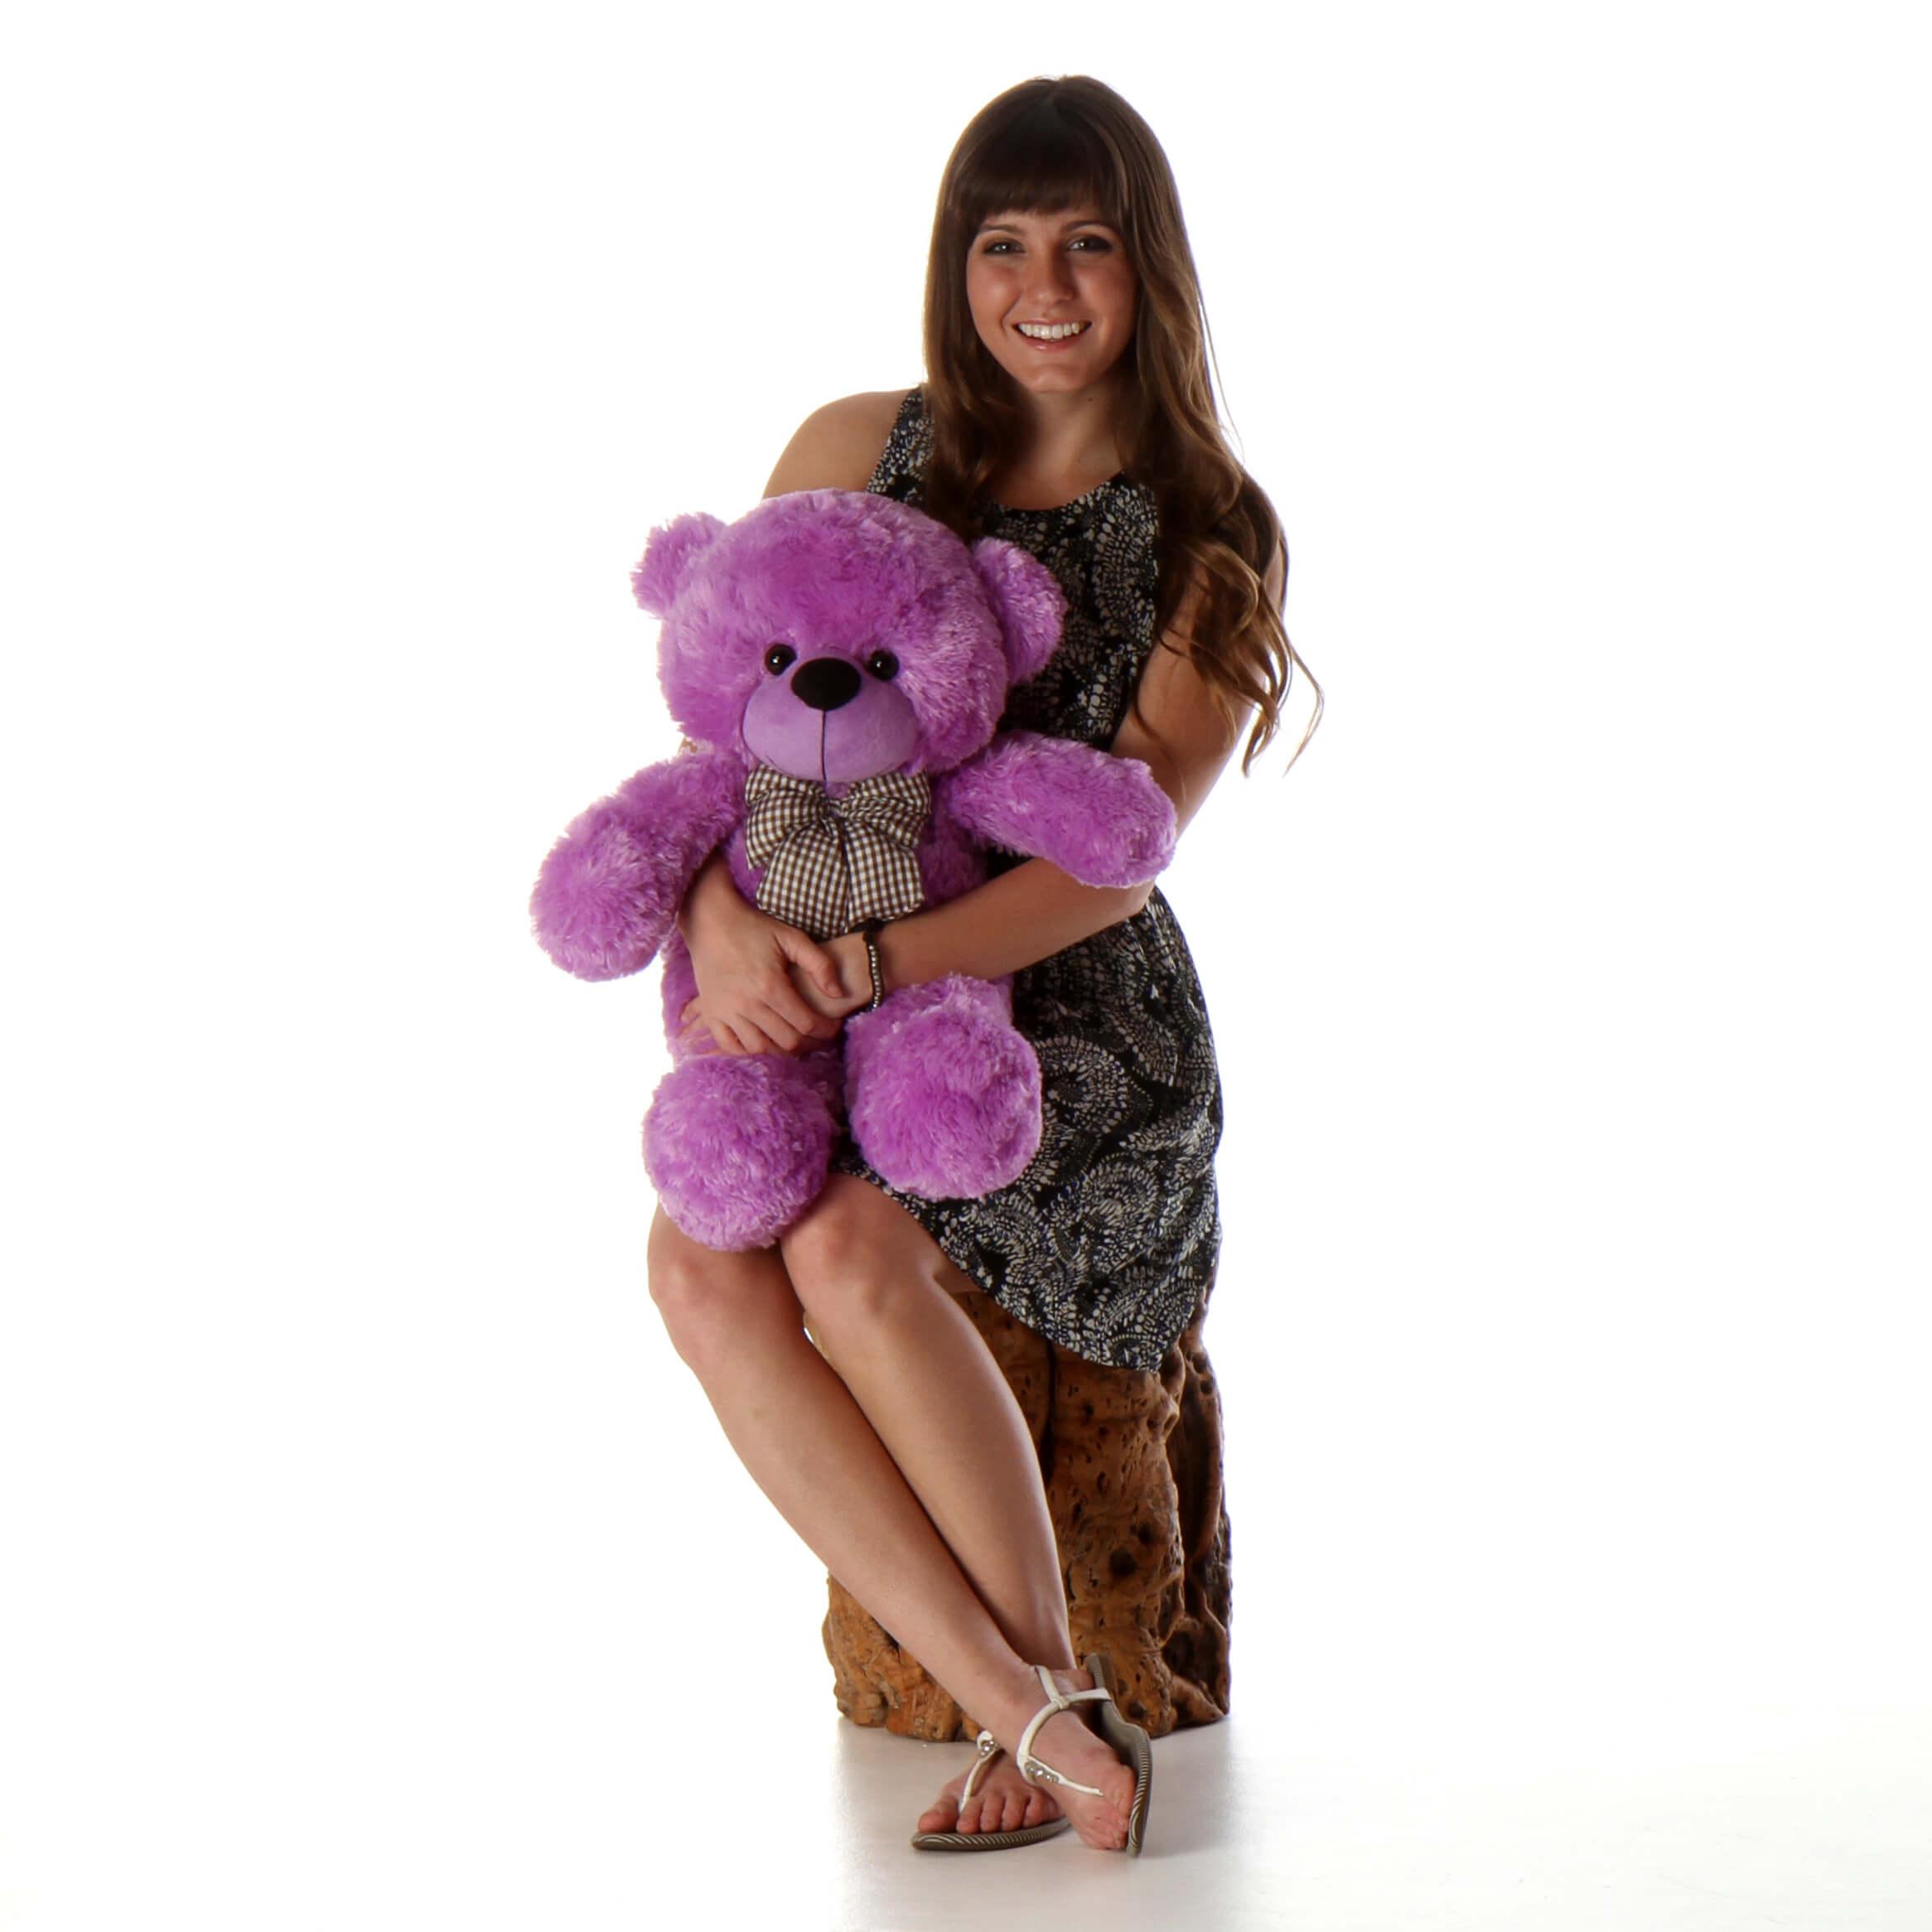 deedee-beautiful-bright-purple-fur-that-is-snuggly-soft-and-so-huggable-1.jpg